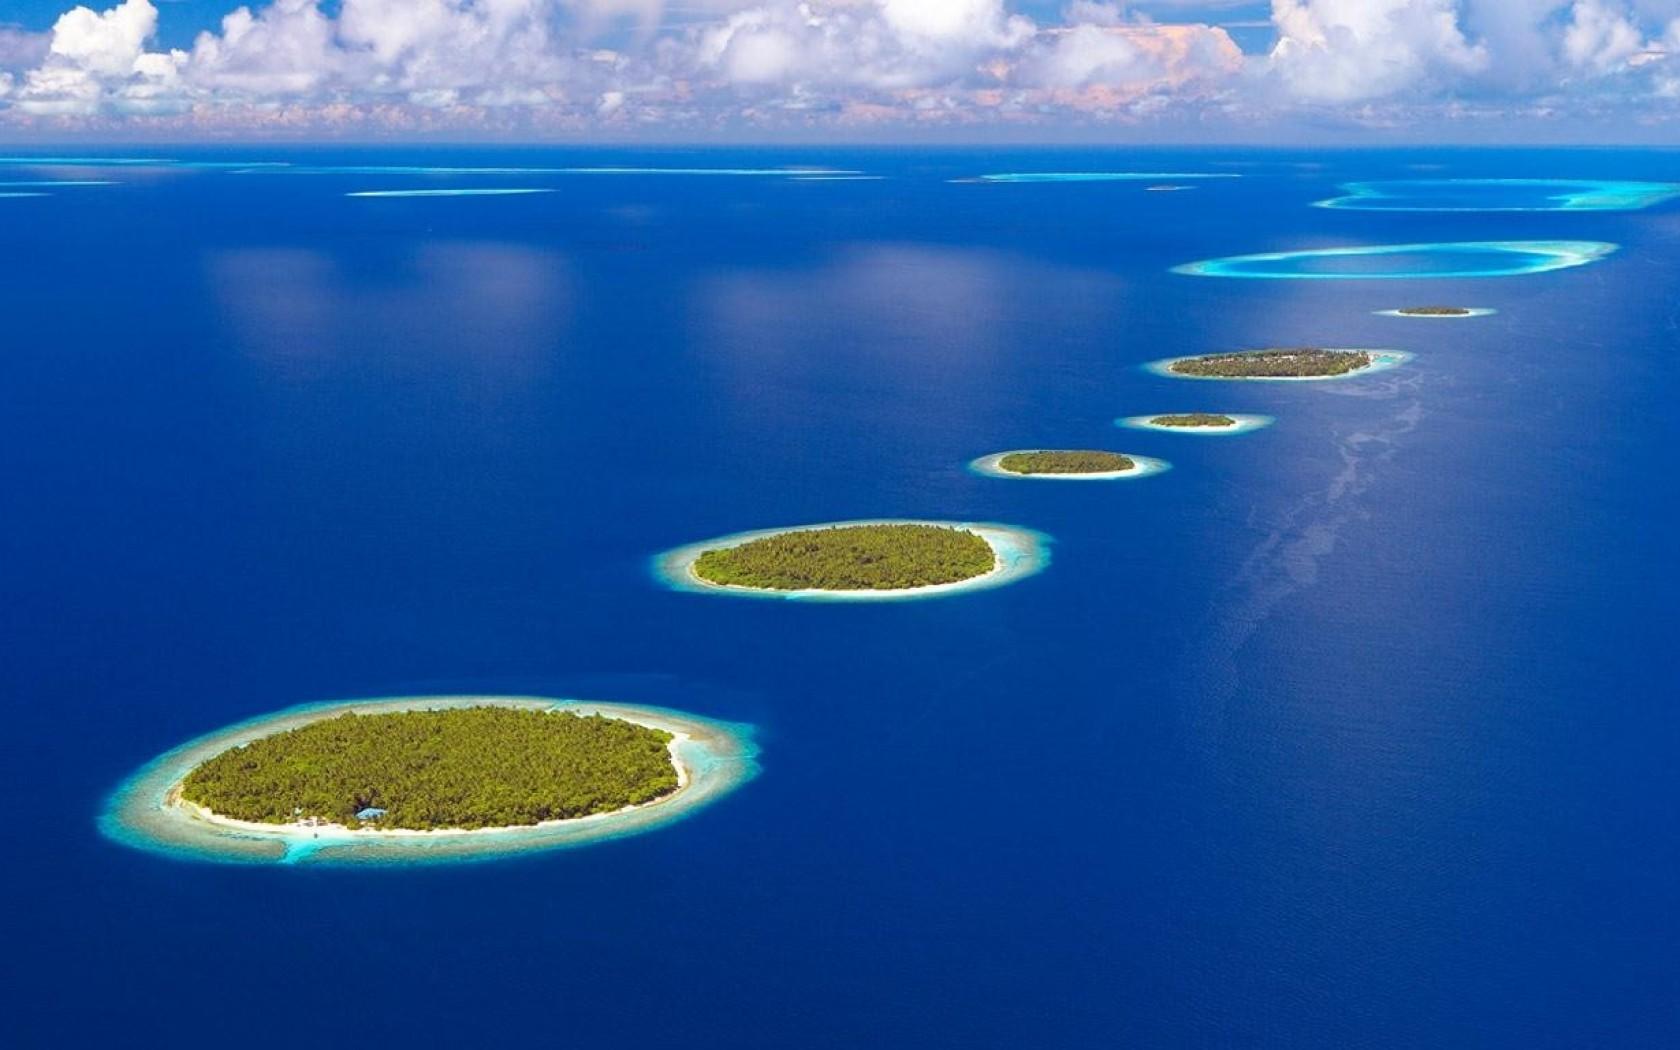 pics Bing Maldives clouds islands landscapes desktop bakcgrounds 1680x1050